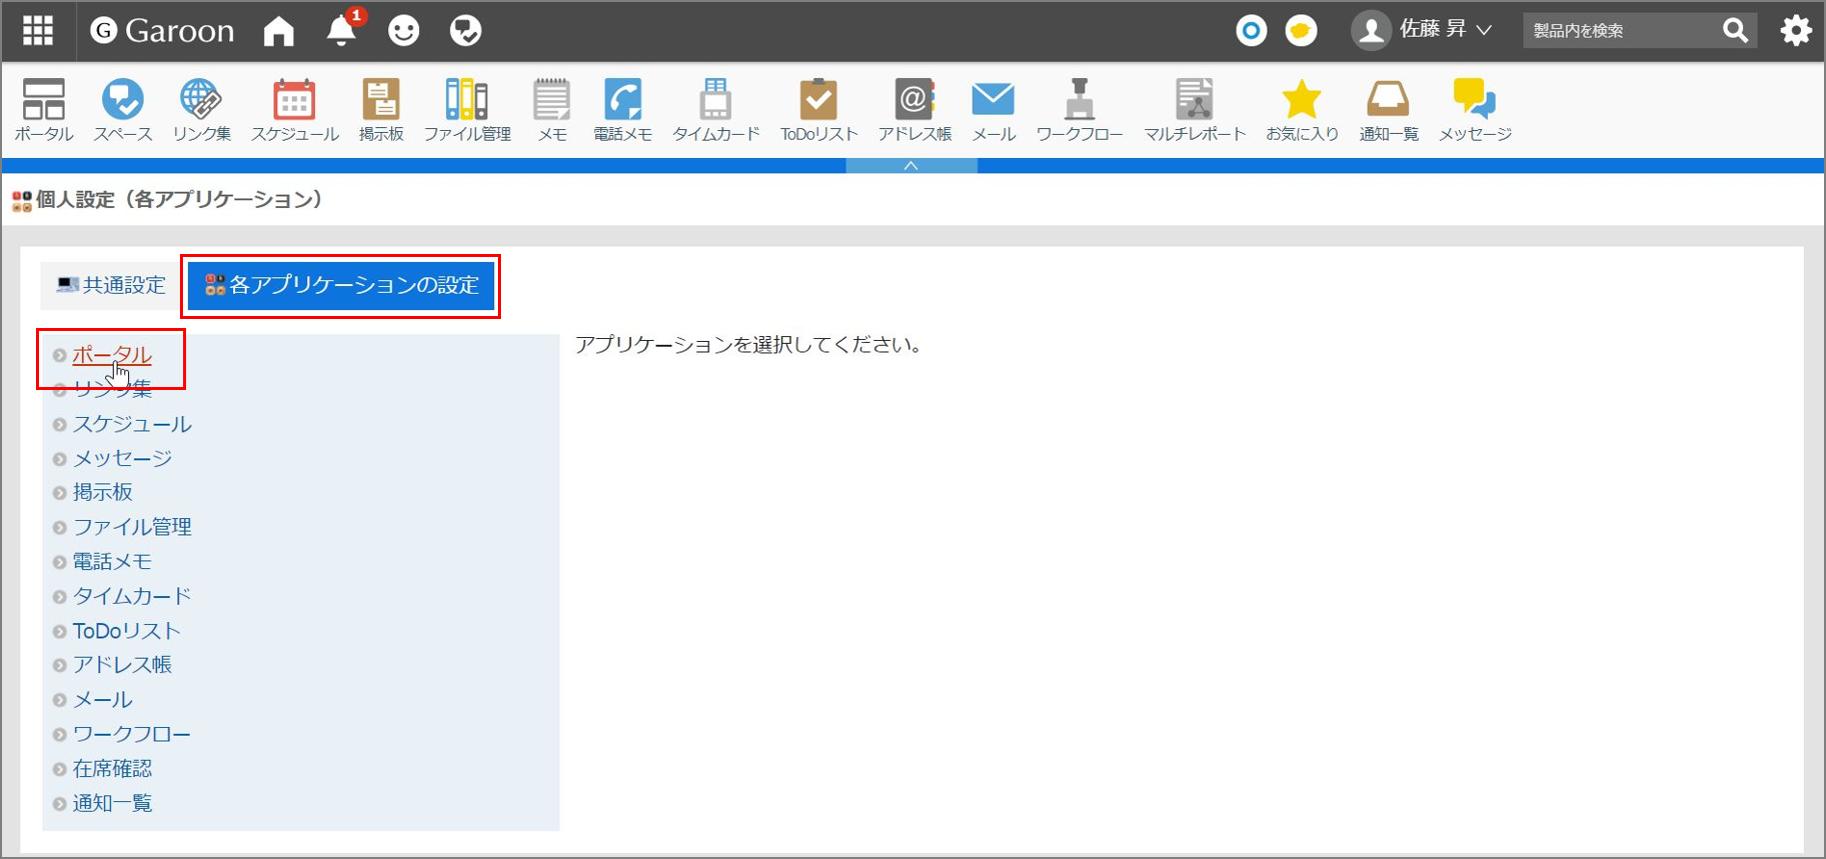 https://enterprise.cybozu.co.jp/48a5427f0ab936933ed32b68972cc31fe7029d2b.png